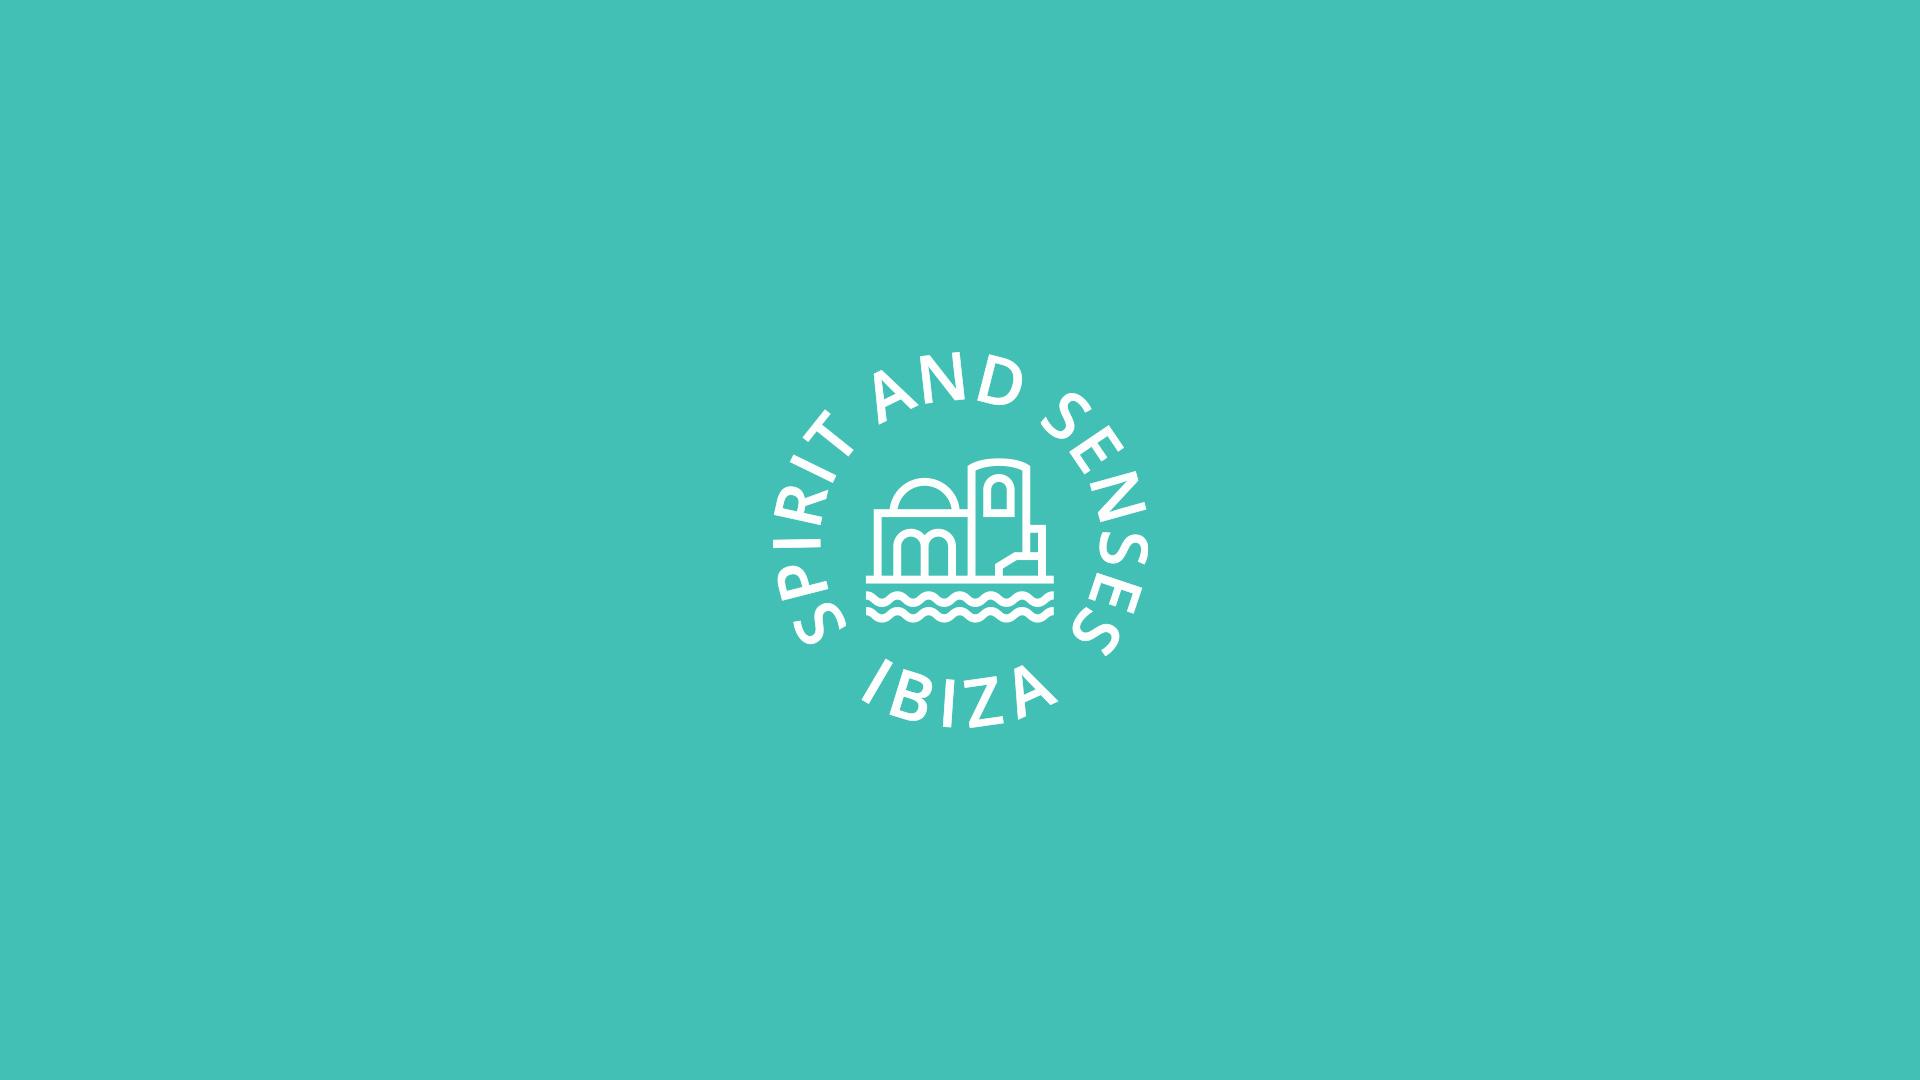 13-spirit-and-senses-ibiza